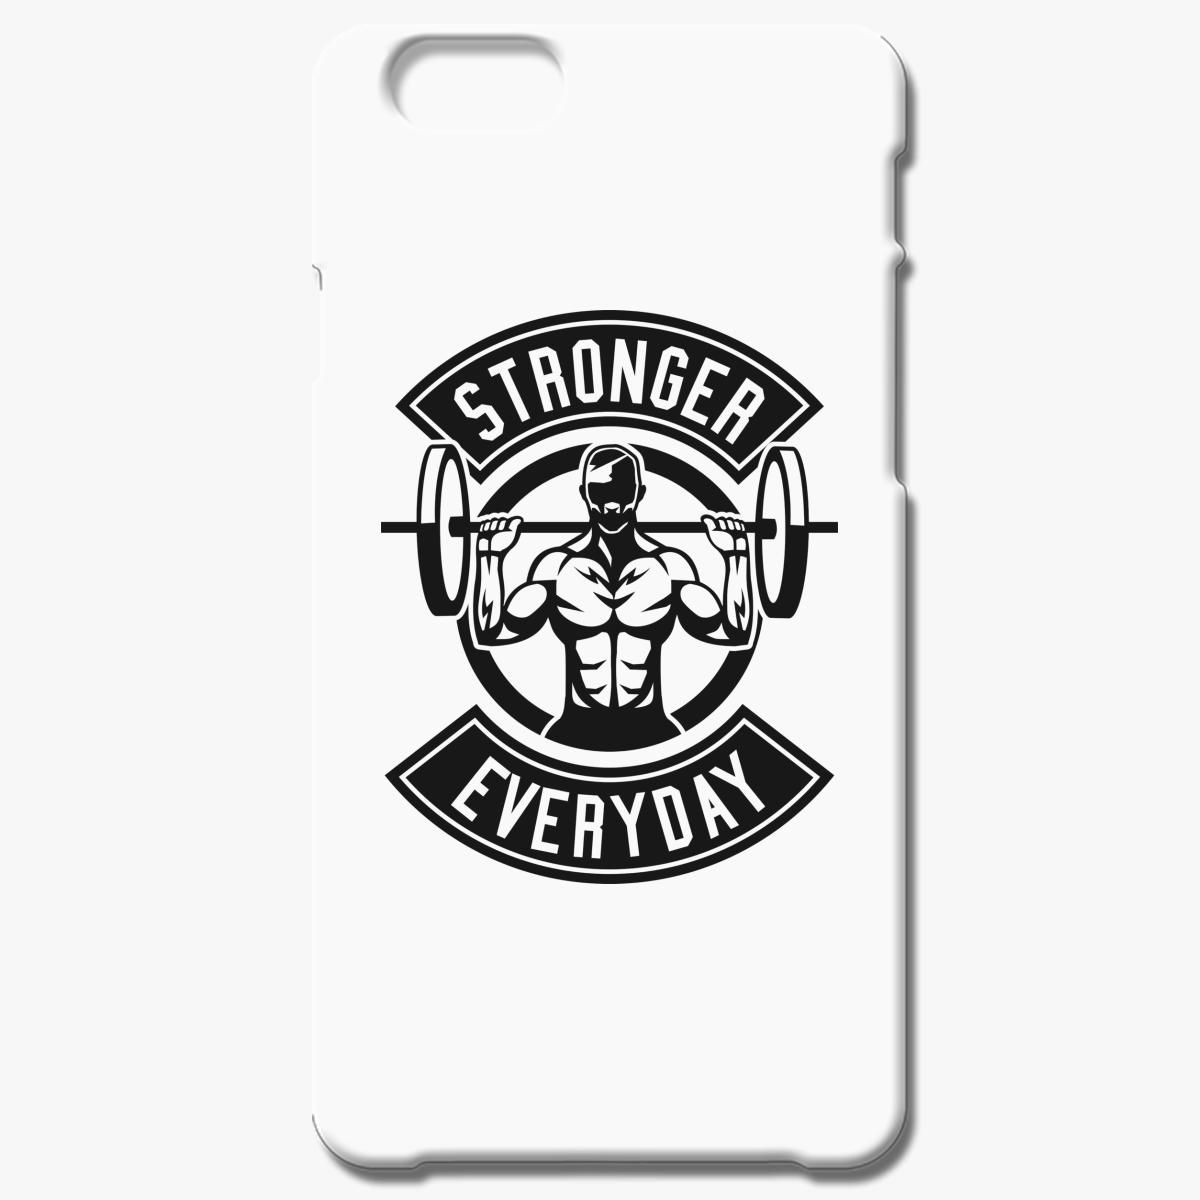 Stronger Everyday Iphone 6 6s Plus Case